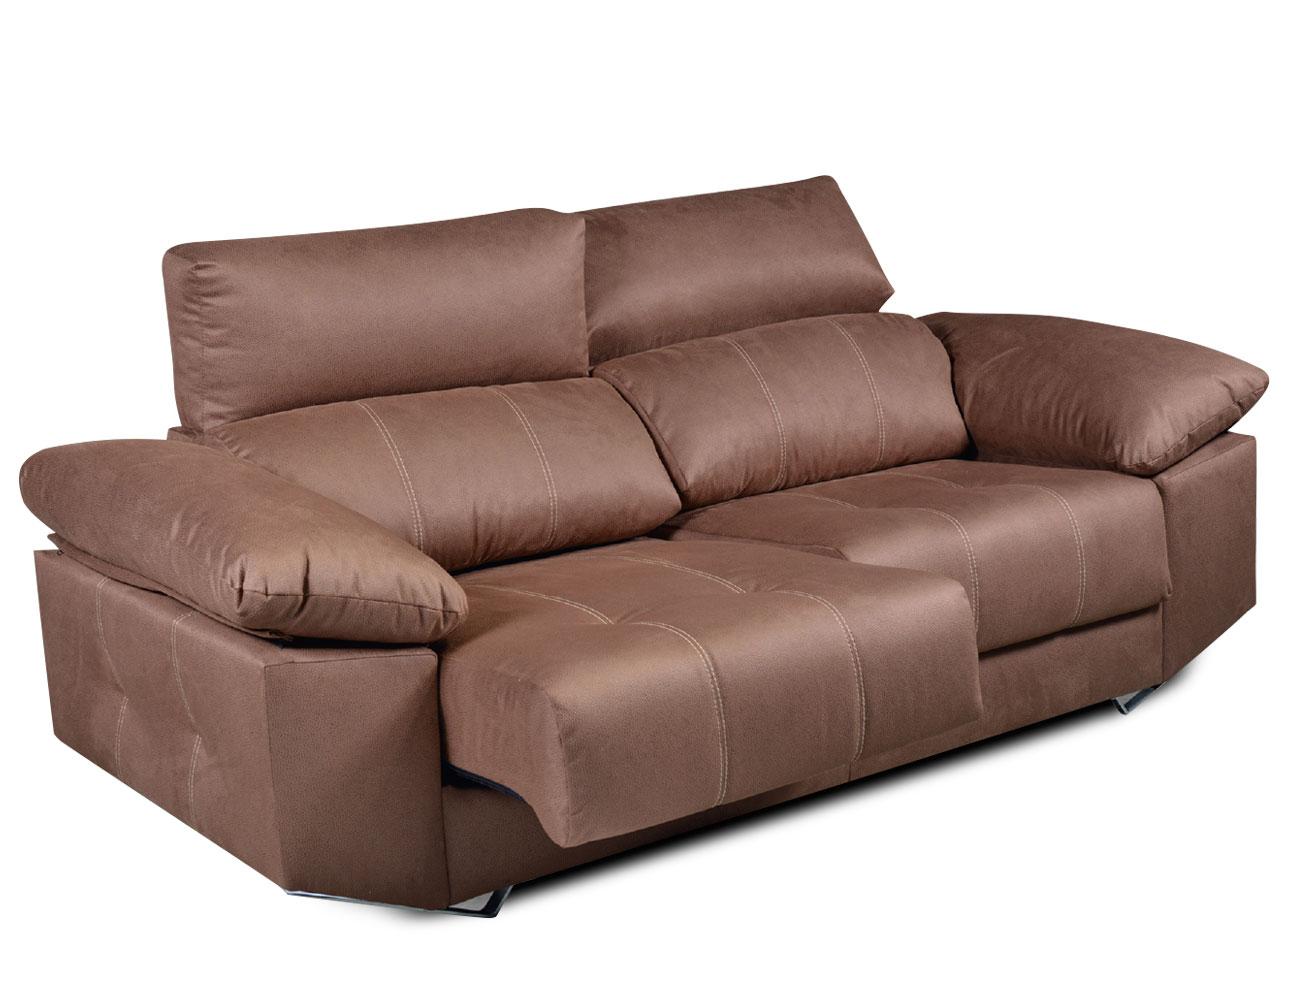 Sofa 3 plazas moderno tejido anti manchas